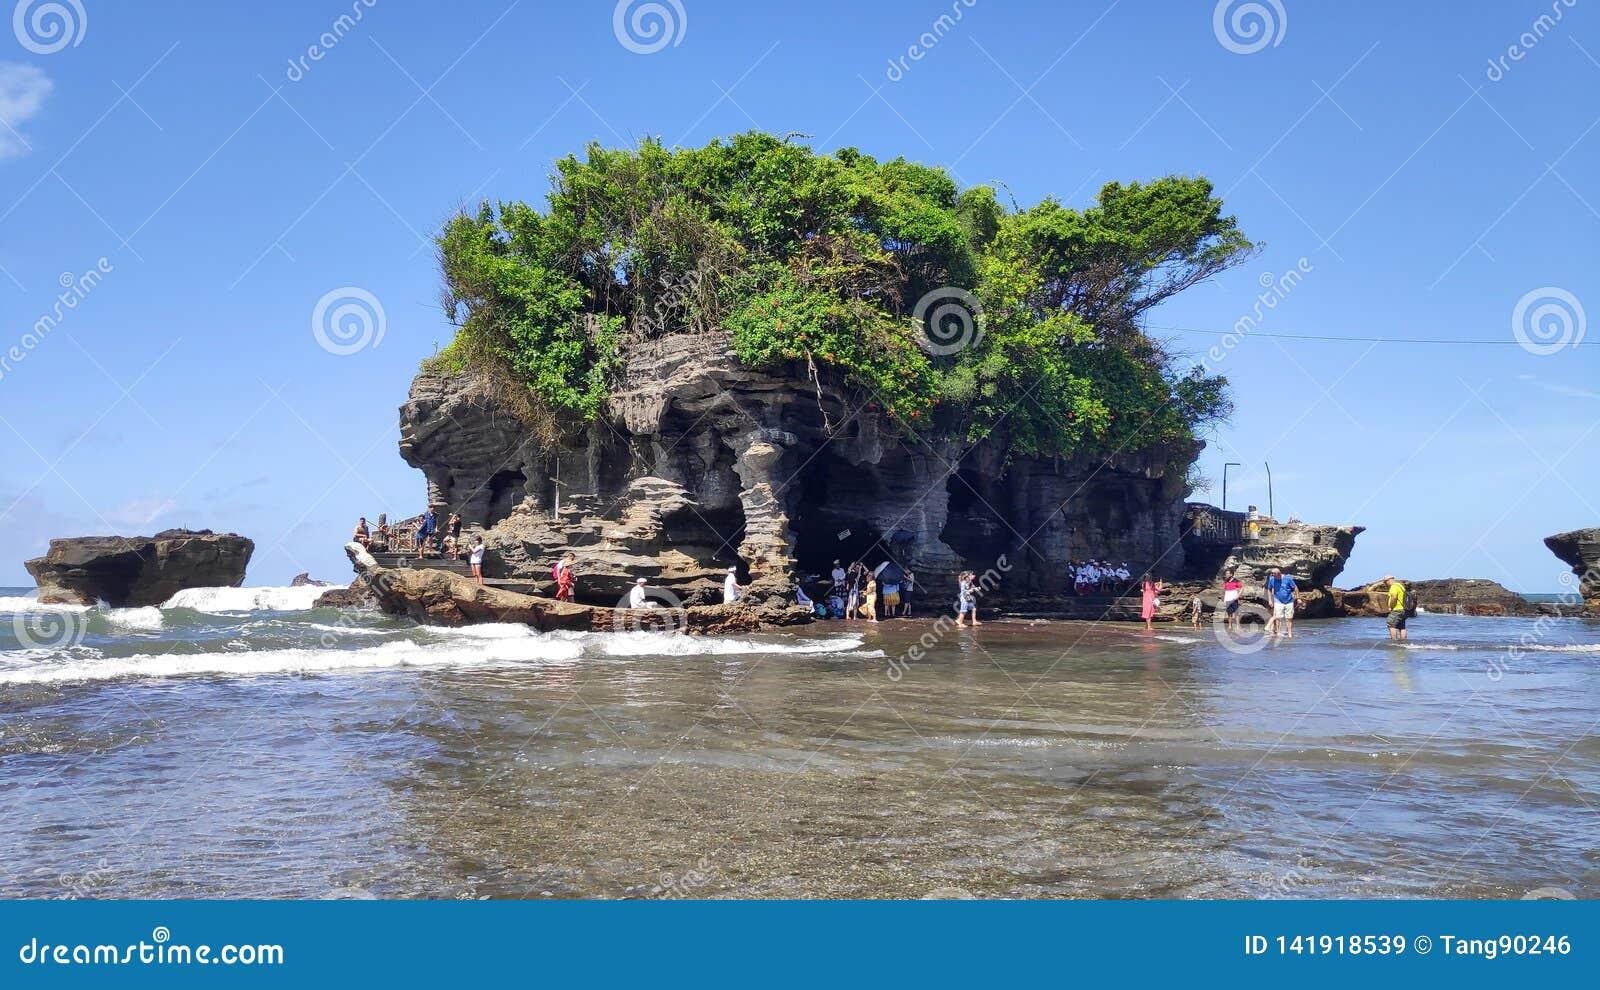 Tanah Lot Water Temple In Bali Island Indonesia Editorial Stock